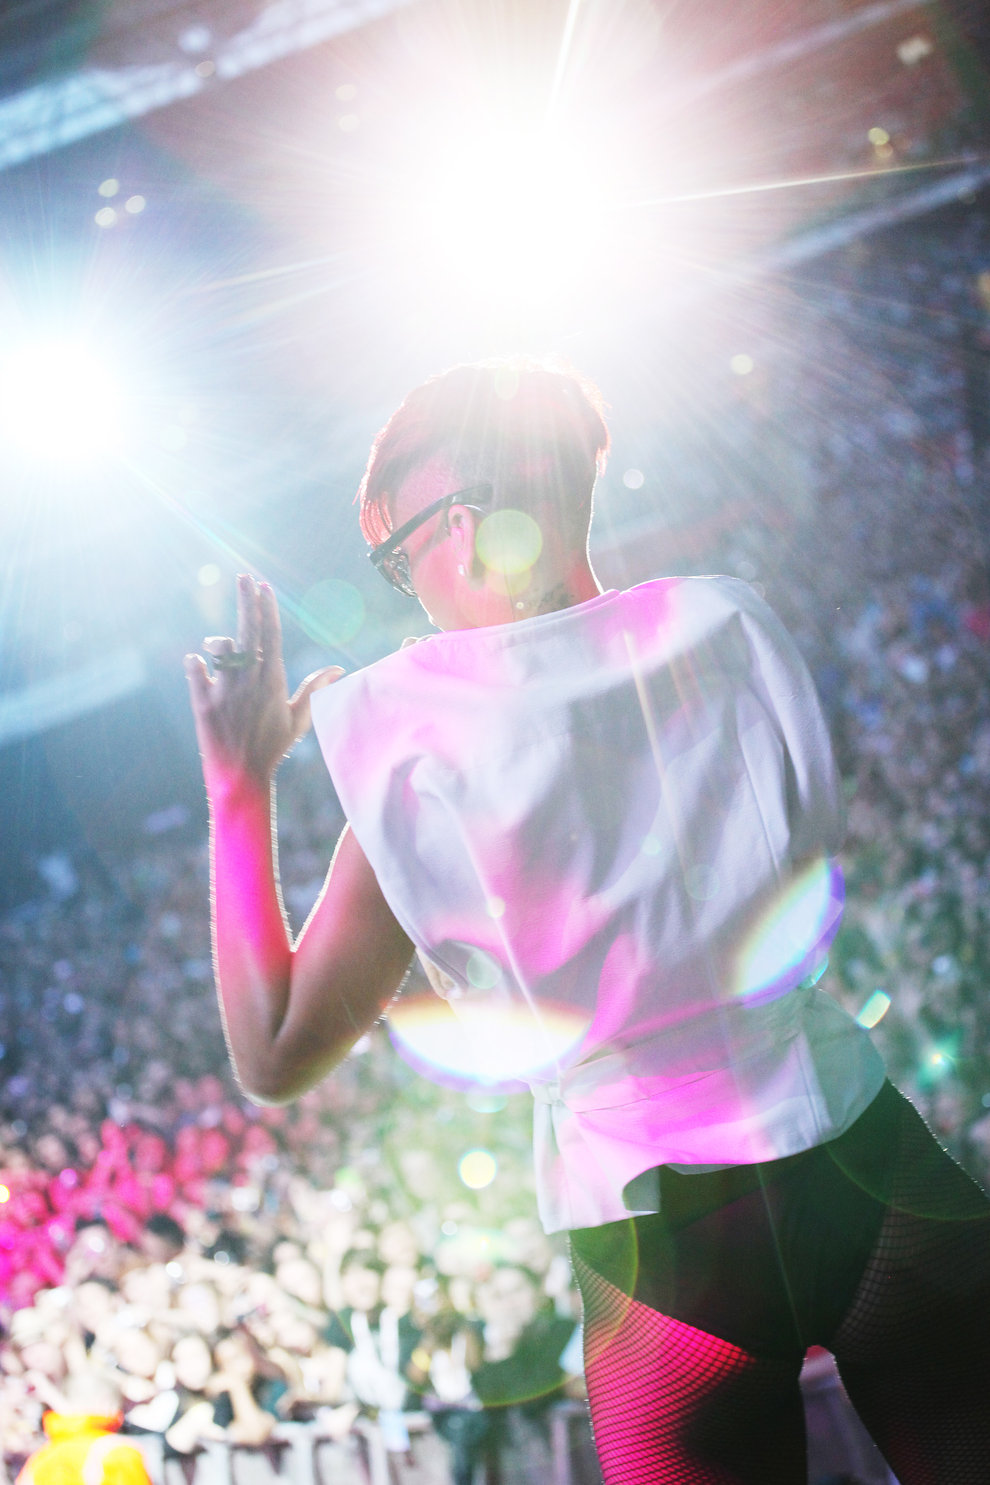 Rihanna closes The Summertime Ball